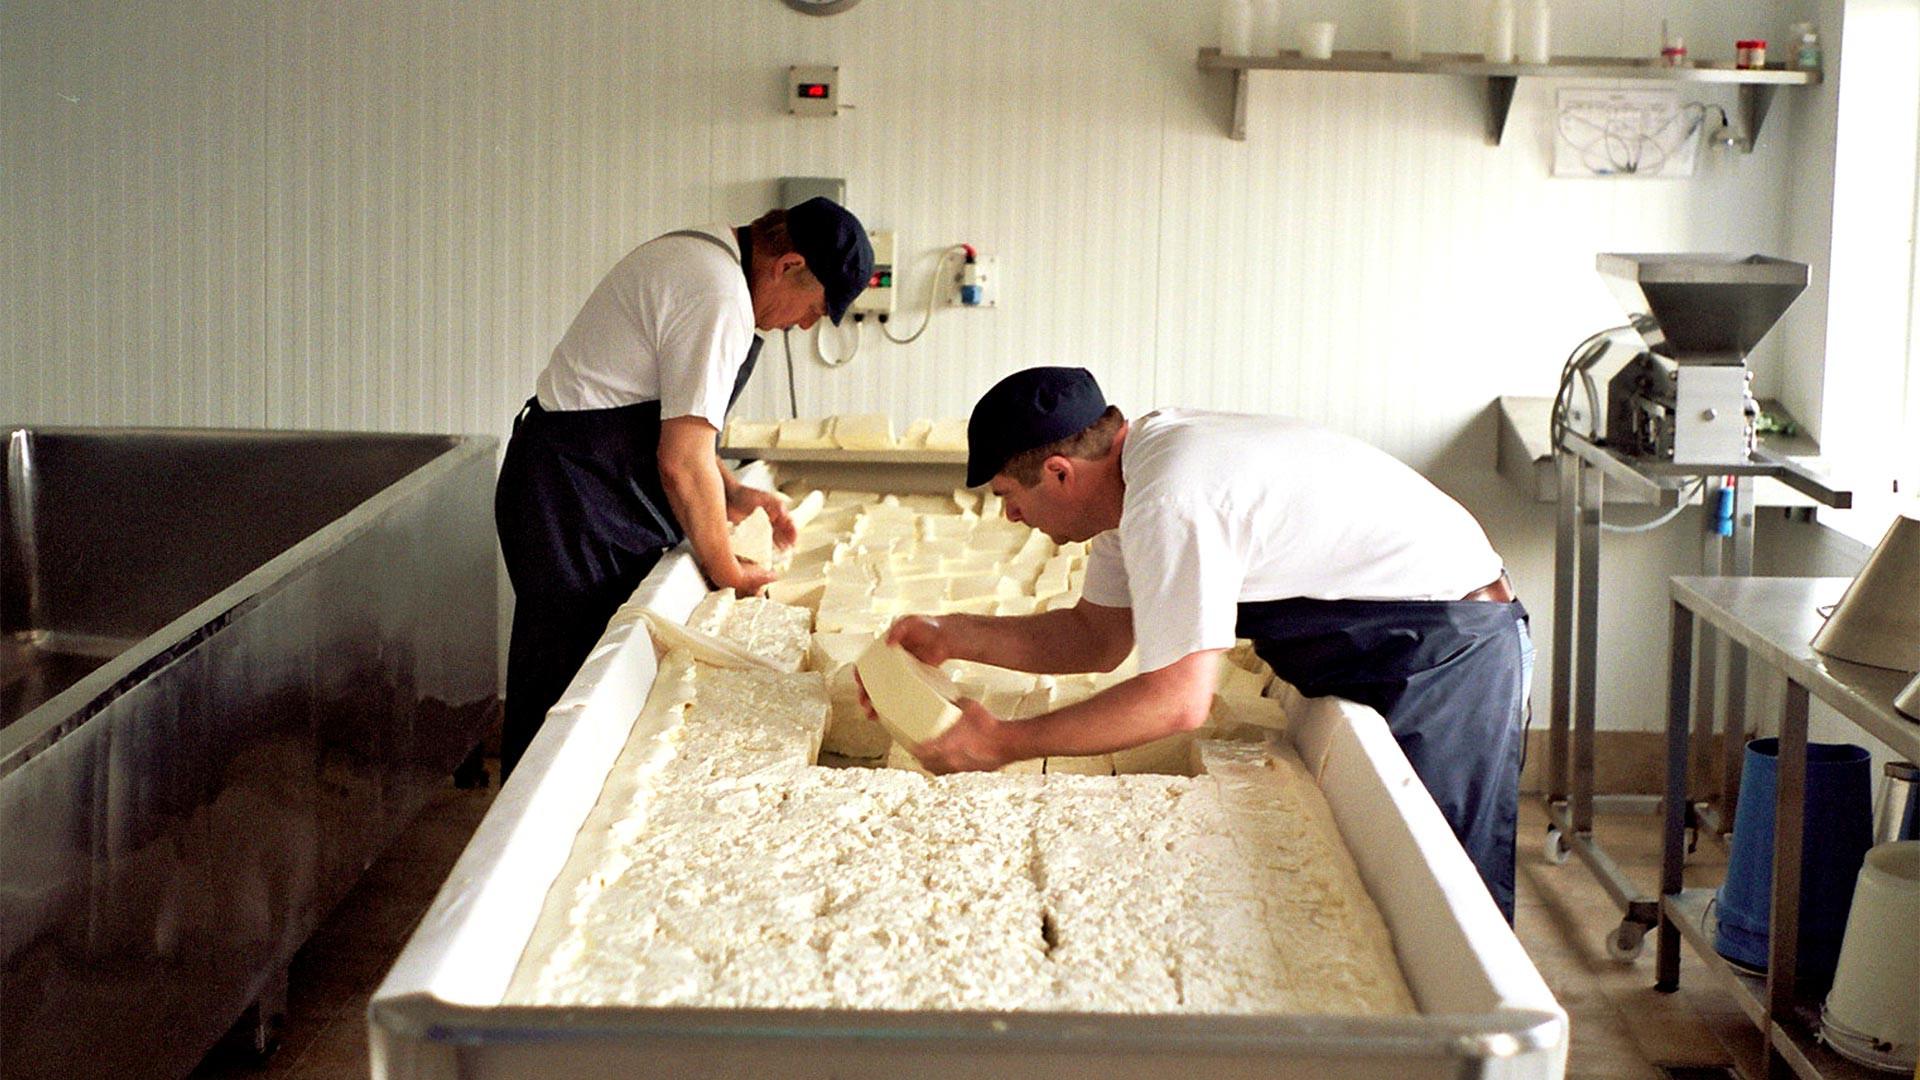 Cutting curd at Stichelton Dairy